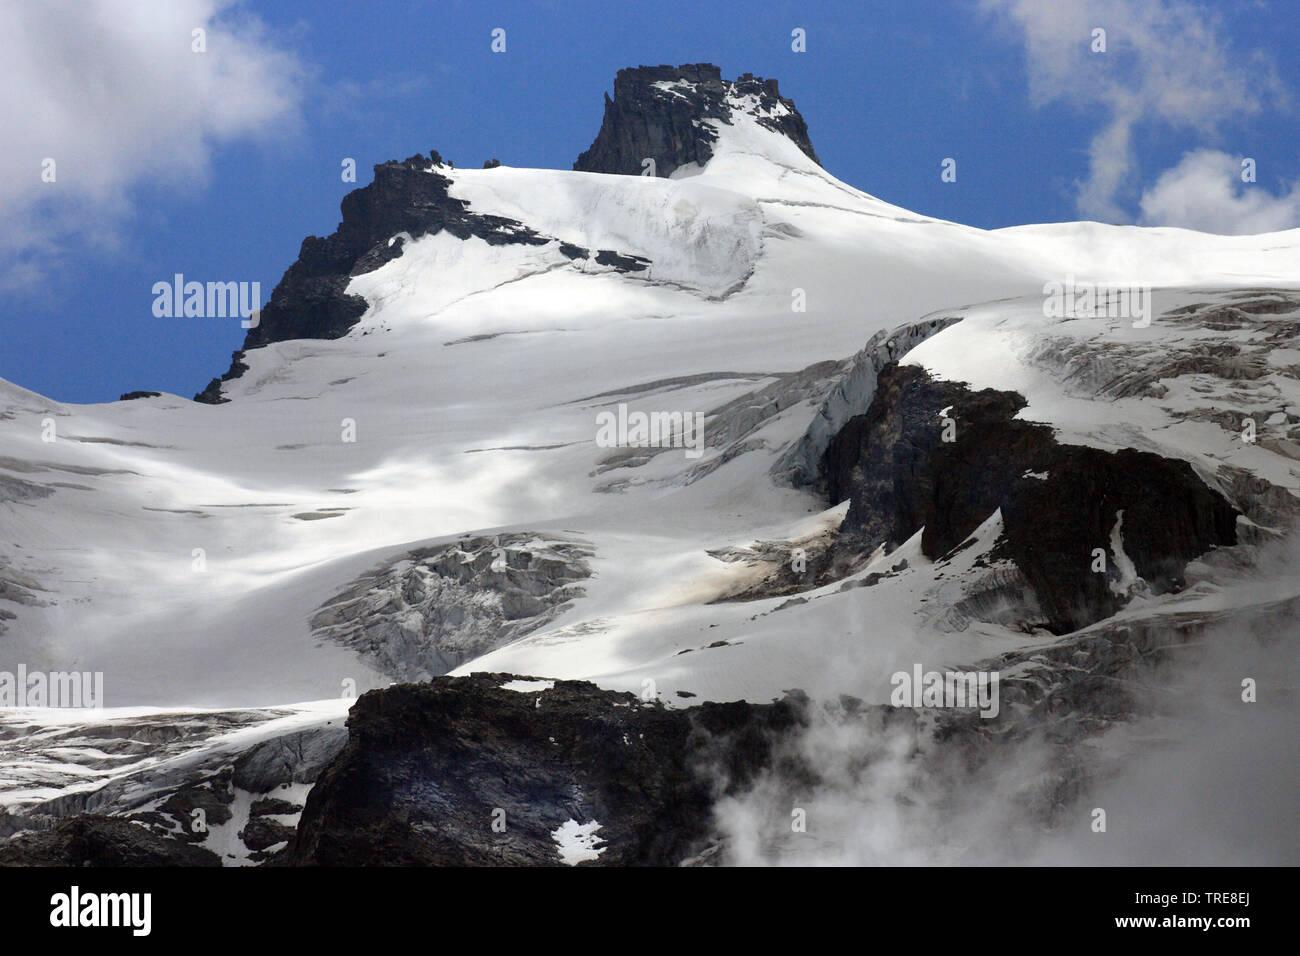 Gran Paradiso, Italien, Gran Paradiso Nationalpark   Gran Paradiso, Italy, Gran Paradiso National Park   BLWS519956.jpg [ (c) blickwinkel/AGAMI/J. van - Stock Image